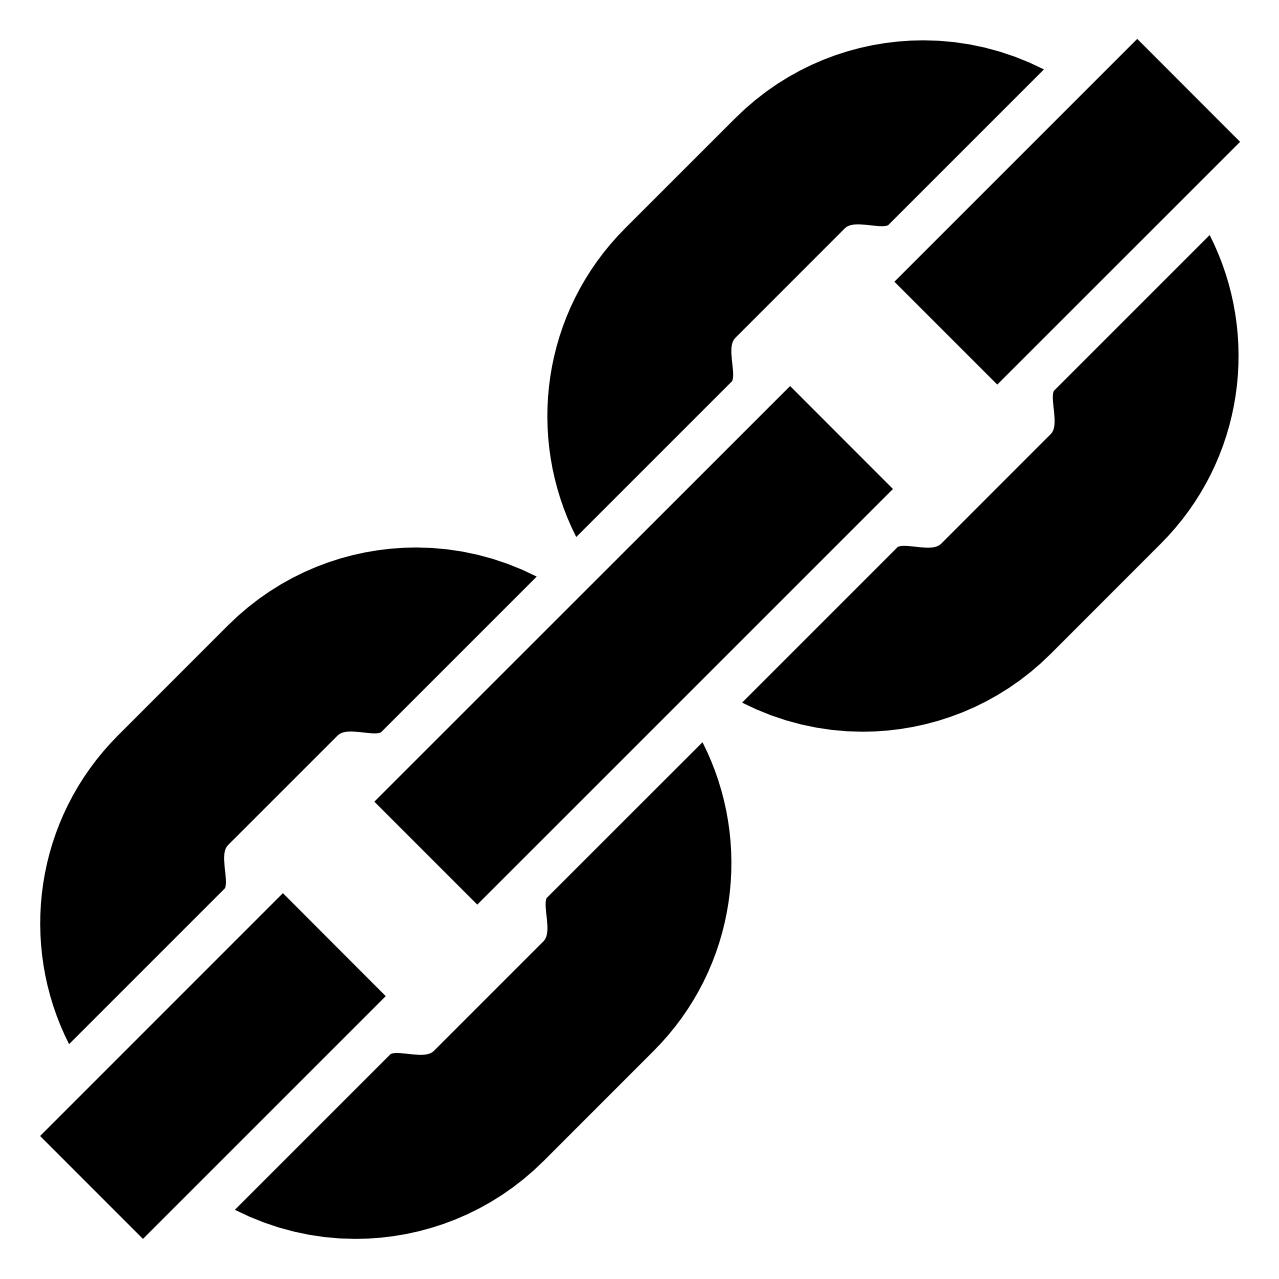 Ball And Chain Clip Art